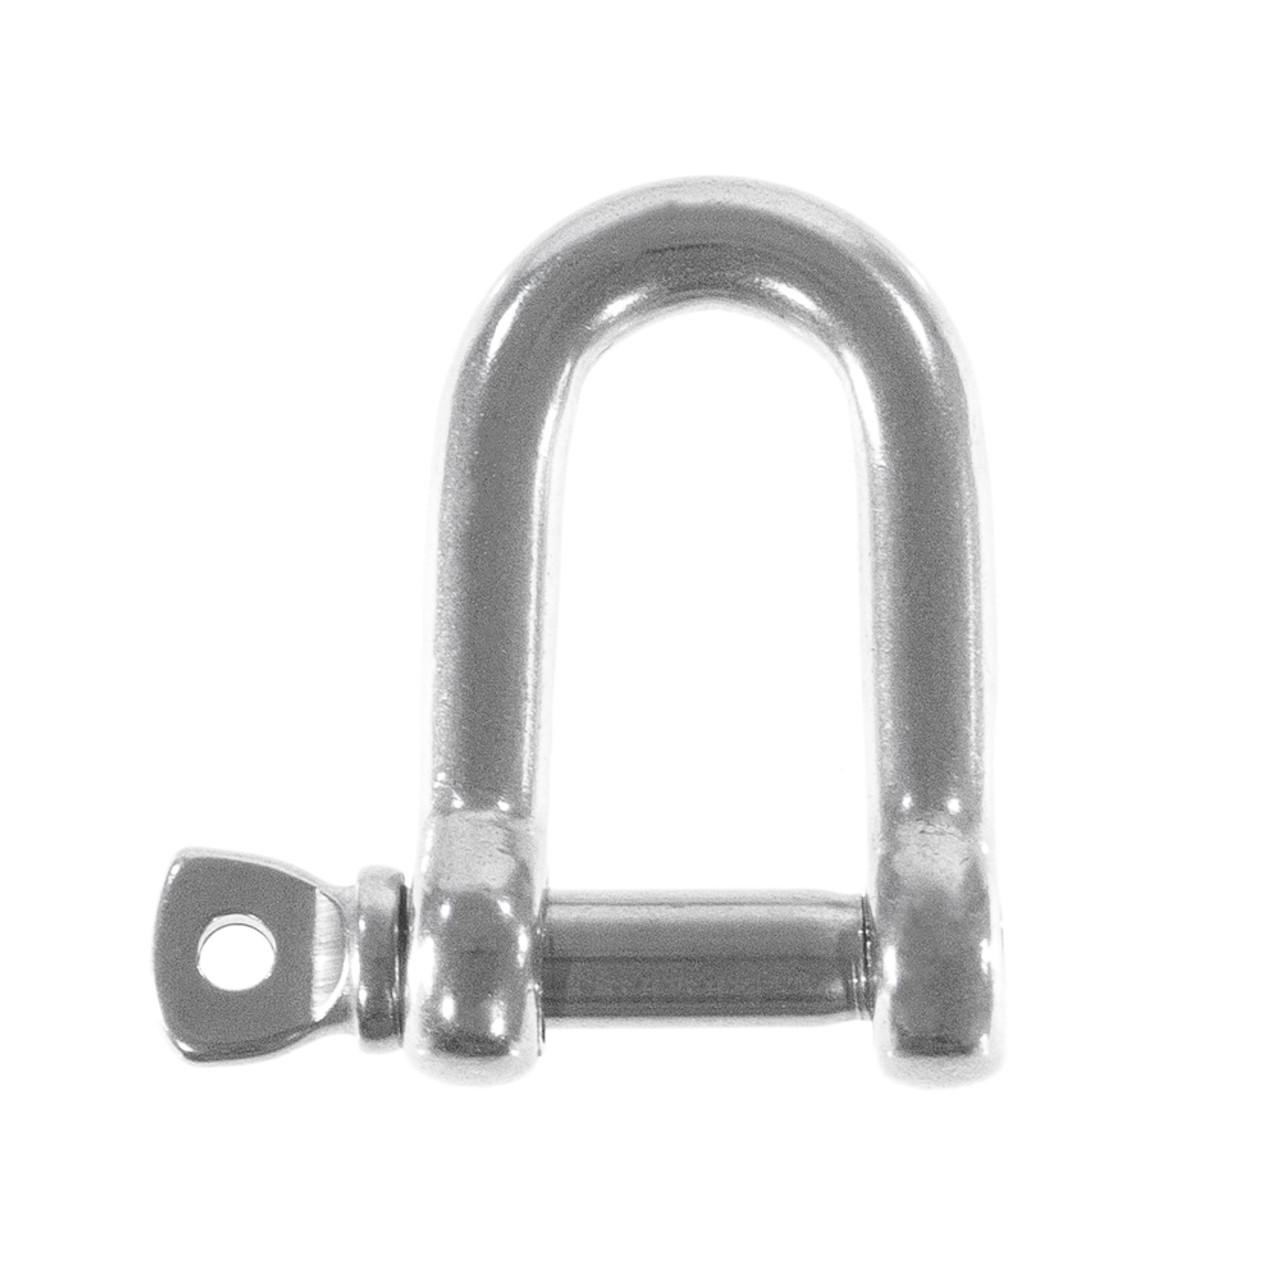 10X Adjustable Stainless Steel U Shaped Shackle Buckle For Paracord Bracelet SP